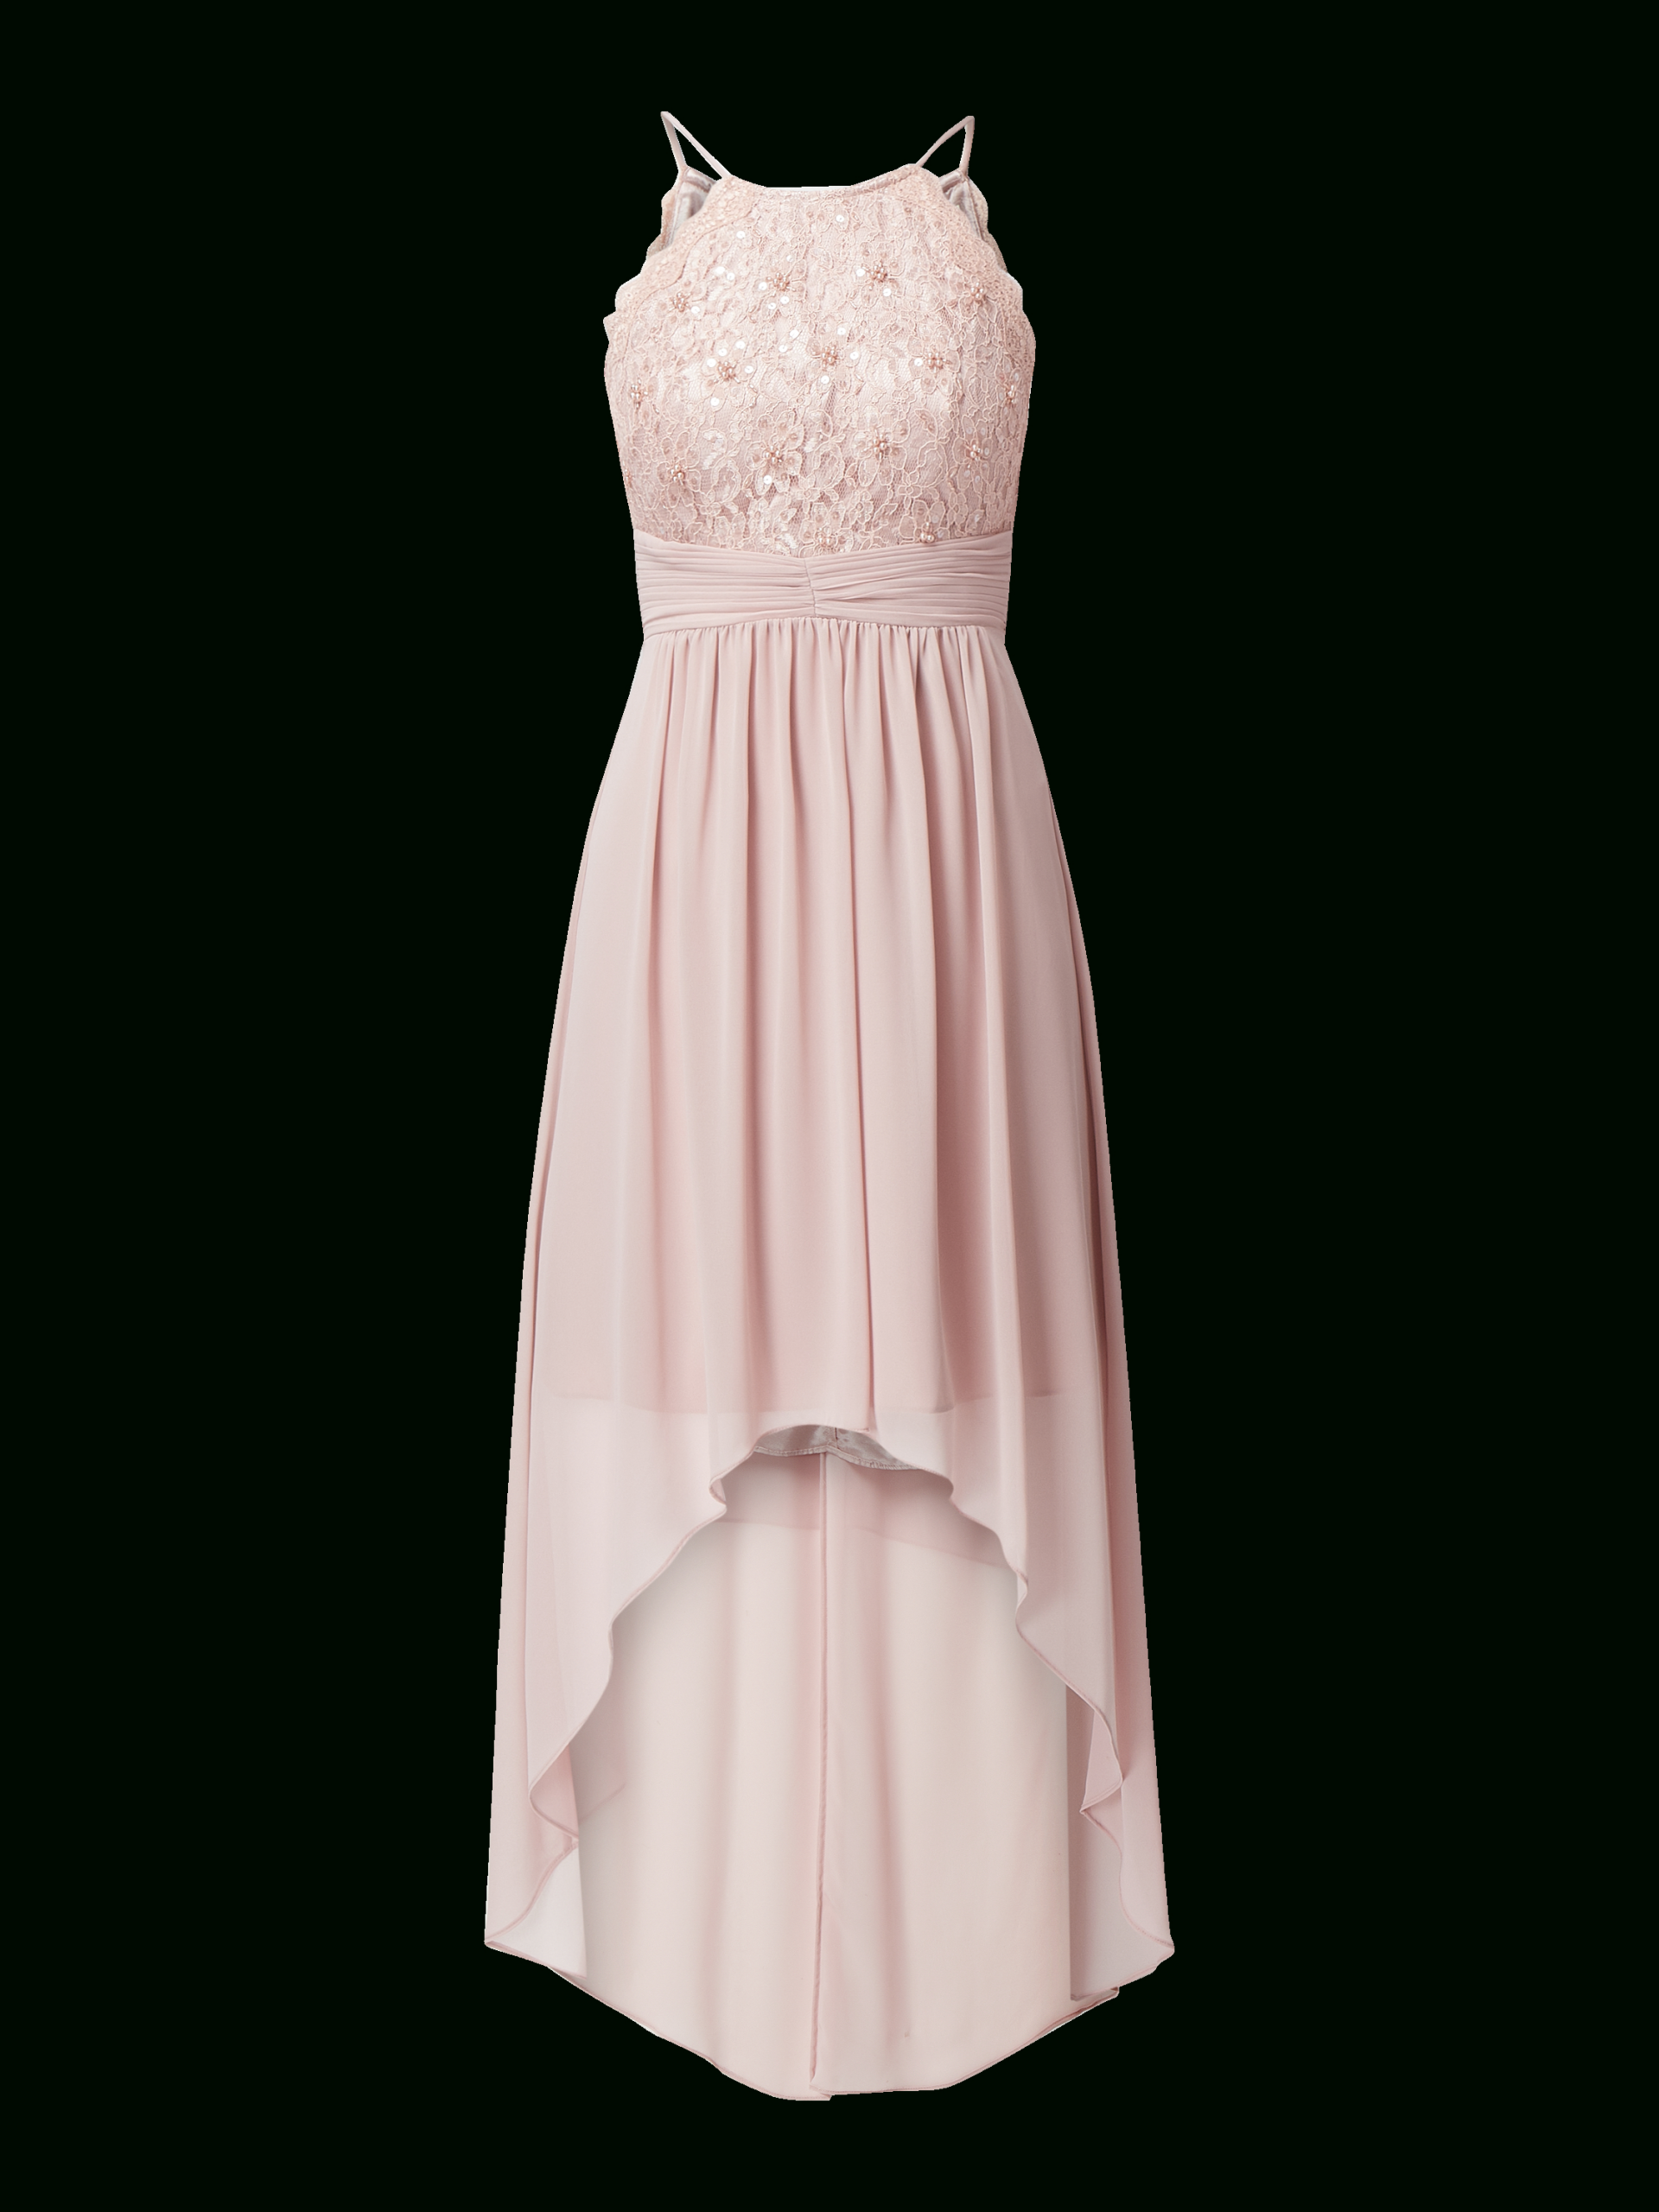 15 Spektakulär Altrosa Kleid Lang BoutiqueAbend Perfekt Altrosa Kleid Lang Boutique